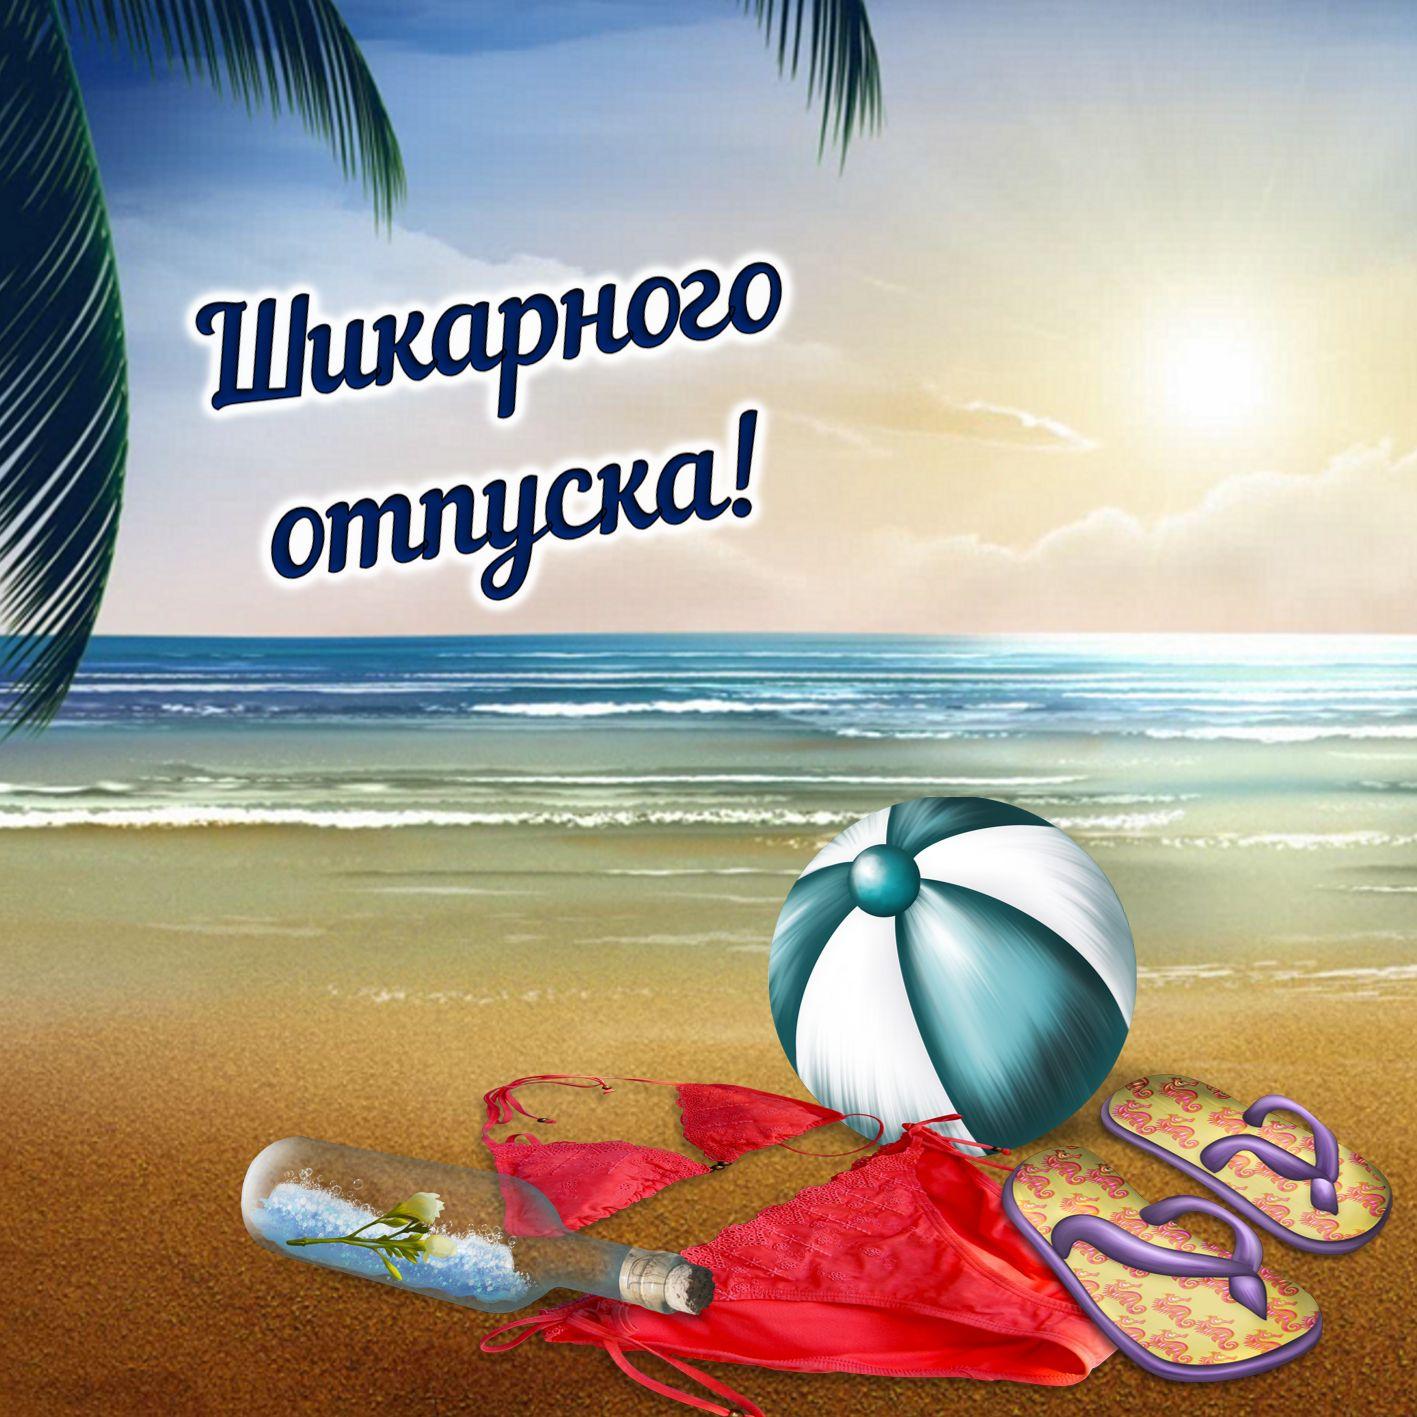 Картинки, открытки про отпуск и море